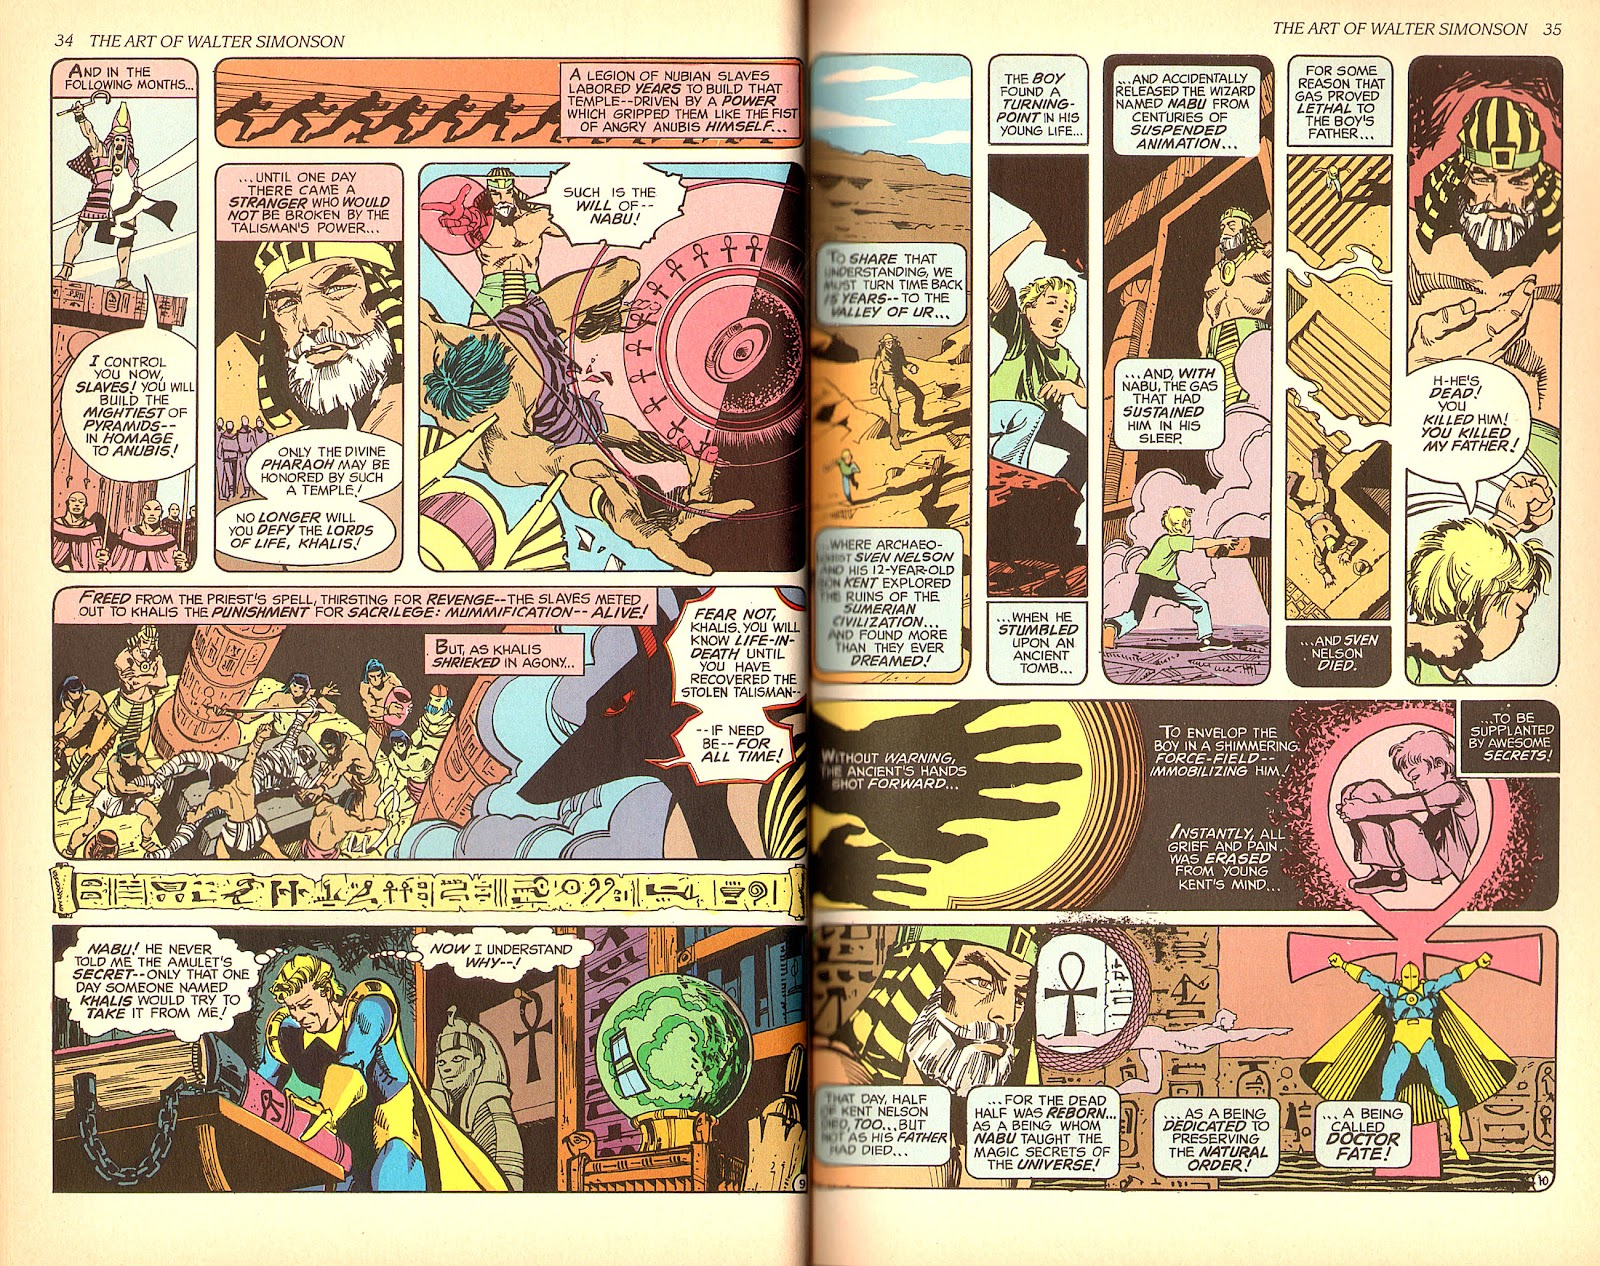 Read online The Art of Walter Simonson comic -  Issue # TPB - 19